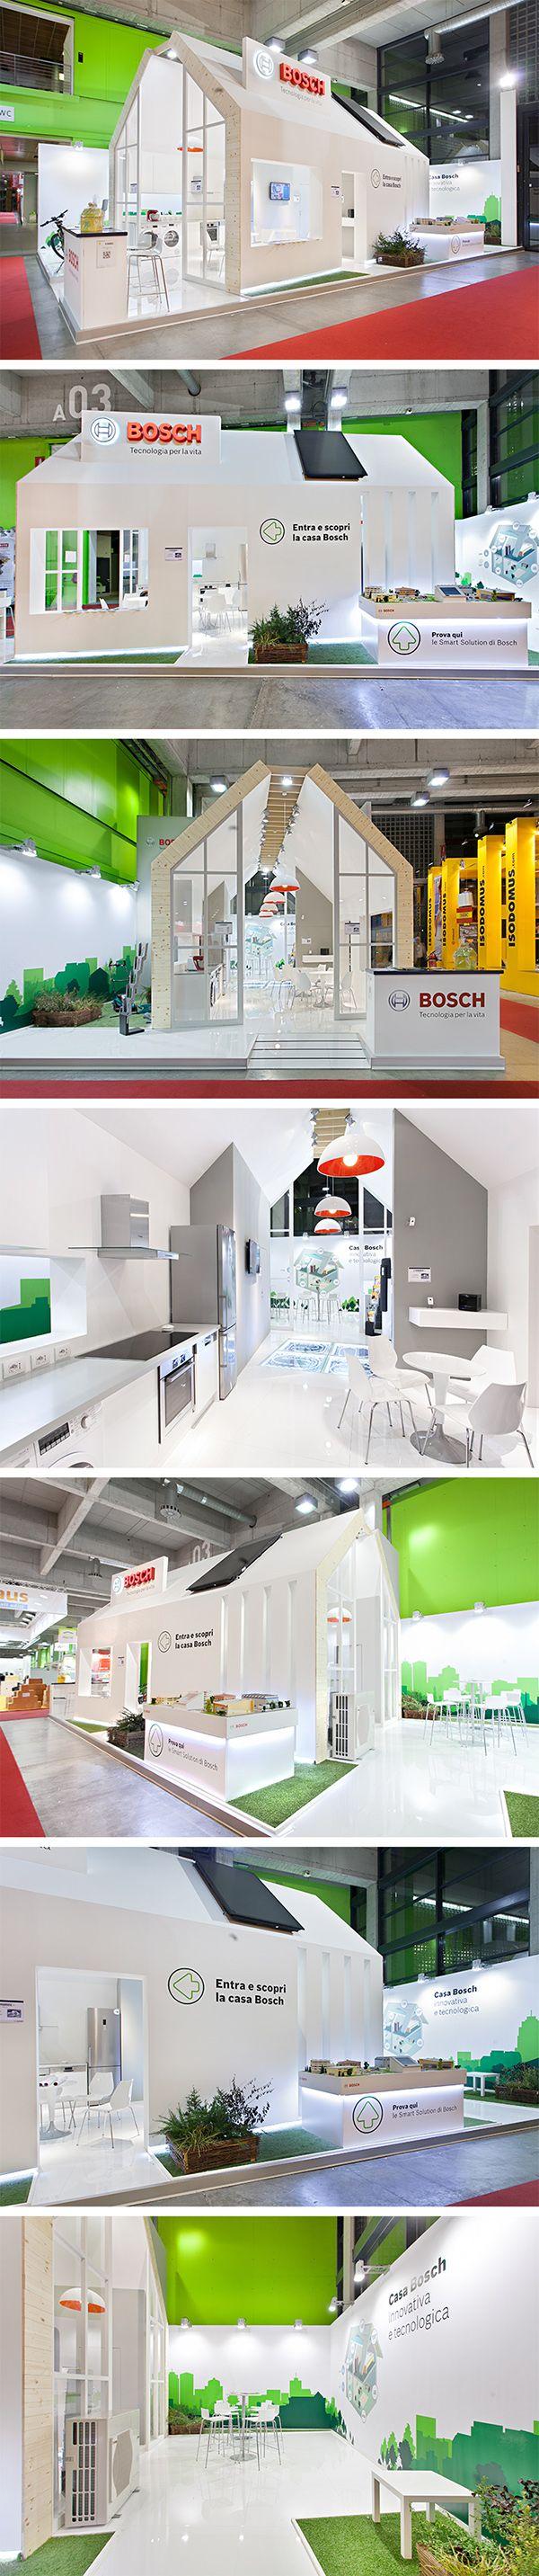 1378 best Exhibition\\Stage\\Event Design images on Pinterest ...